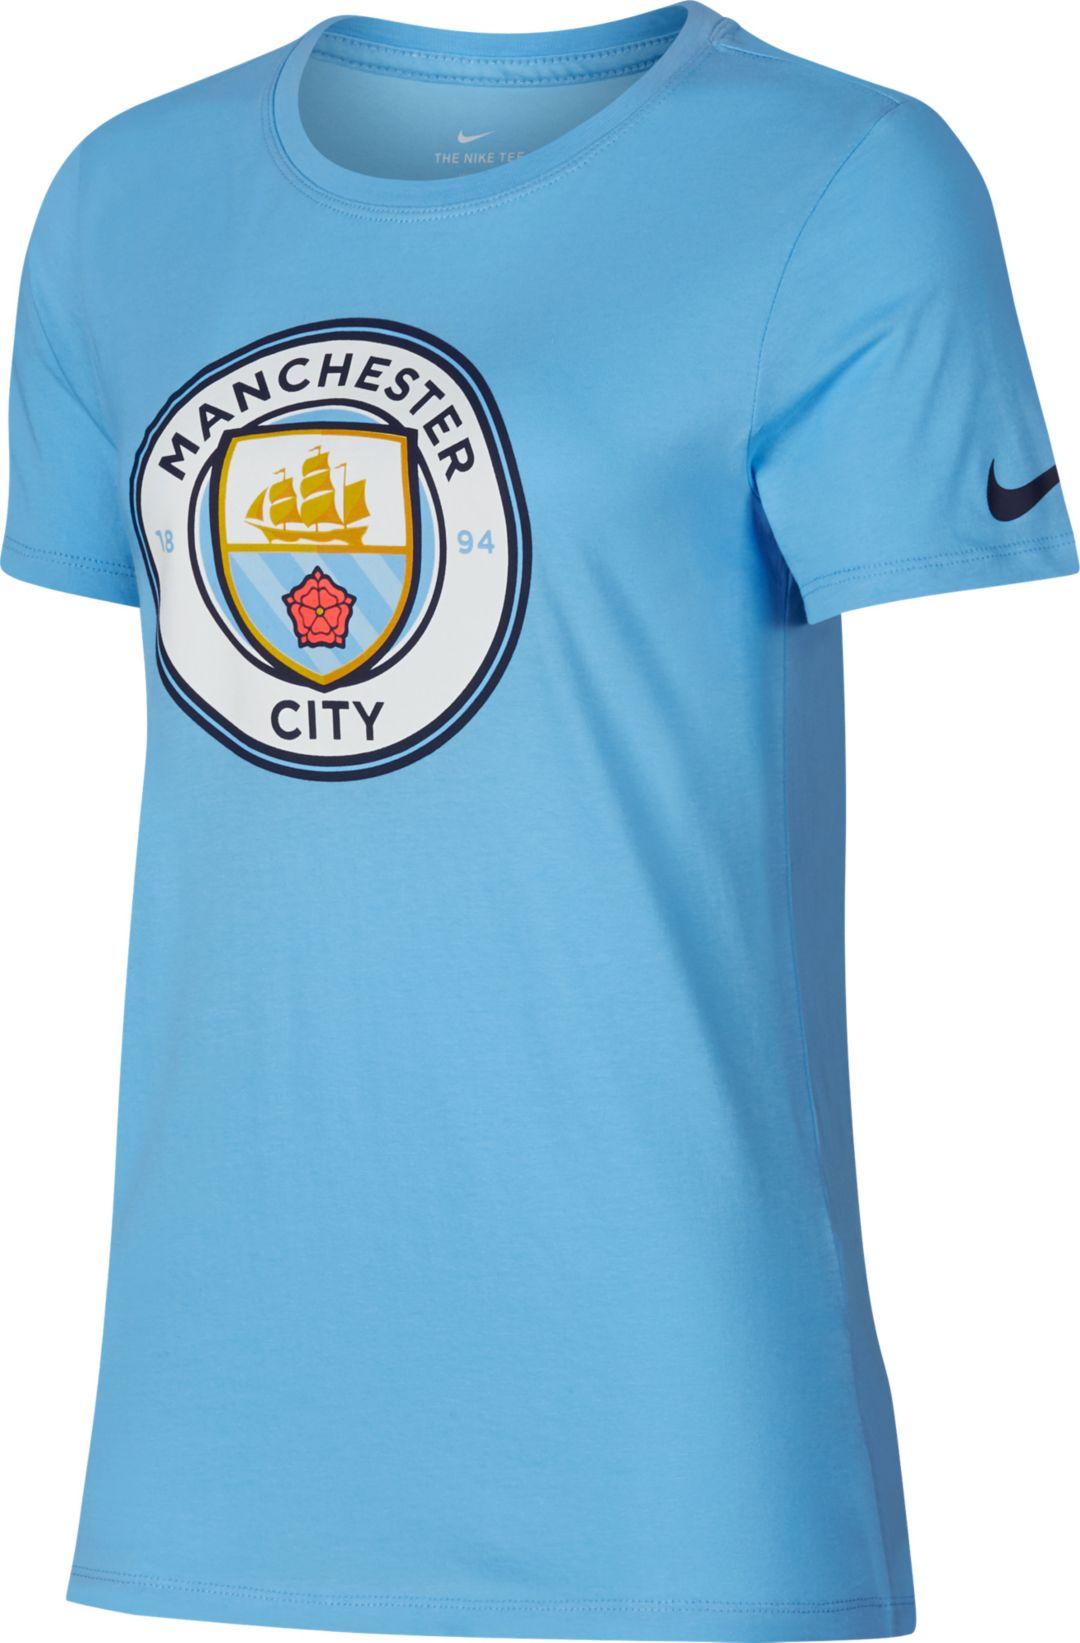 quality design 451fd ec7c0 Nike Women's Manchester City Crest Blue T-Shirt